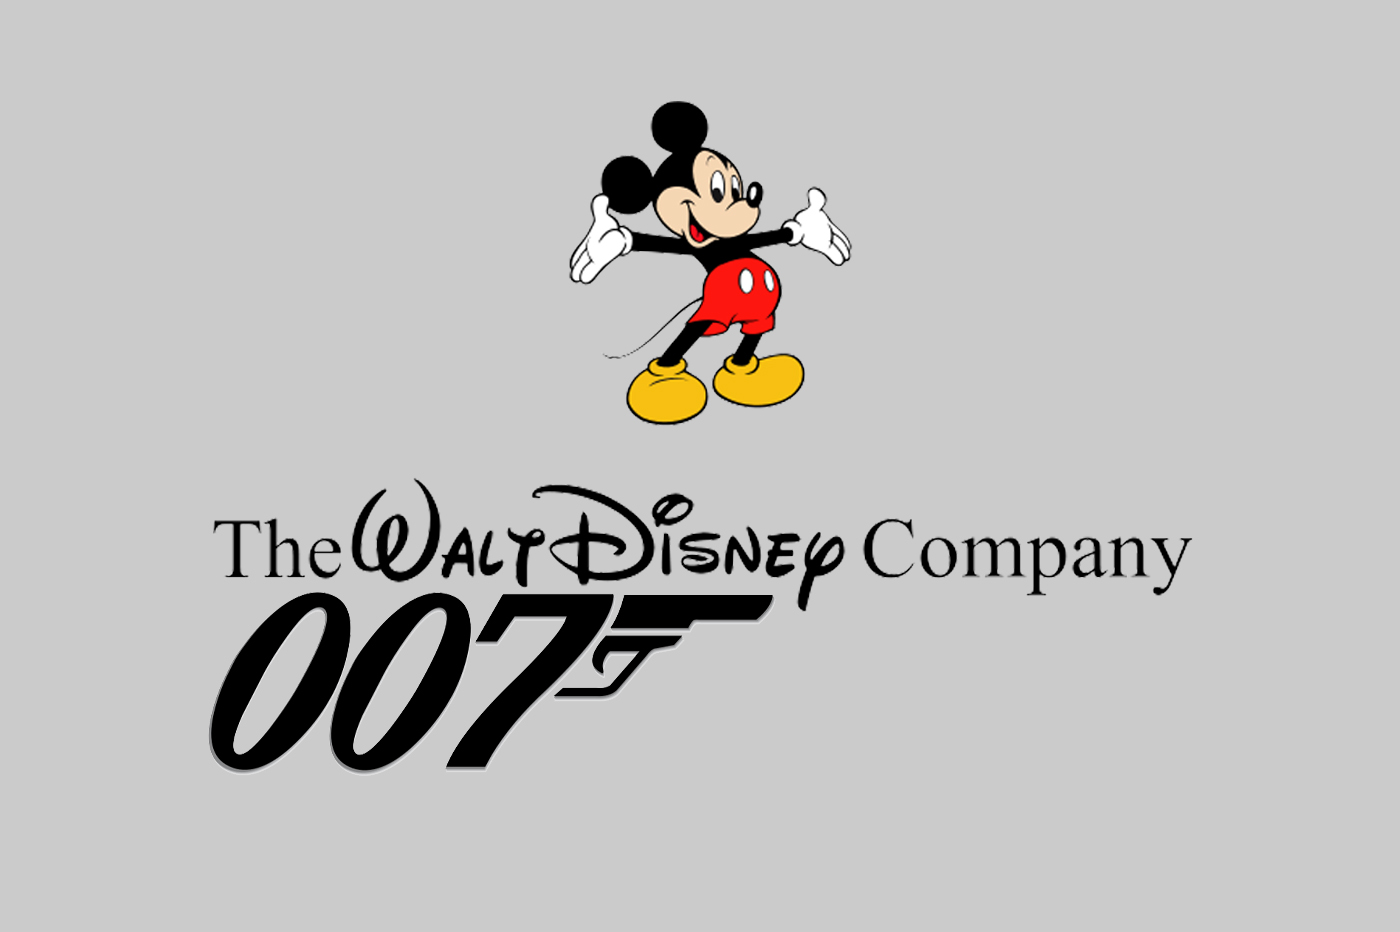 Disney 007 James Bond